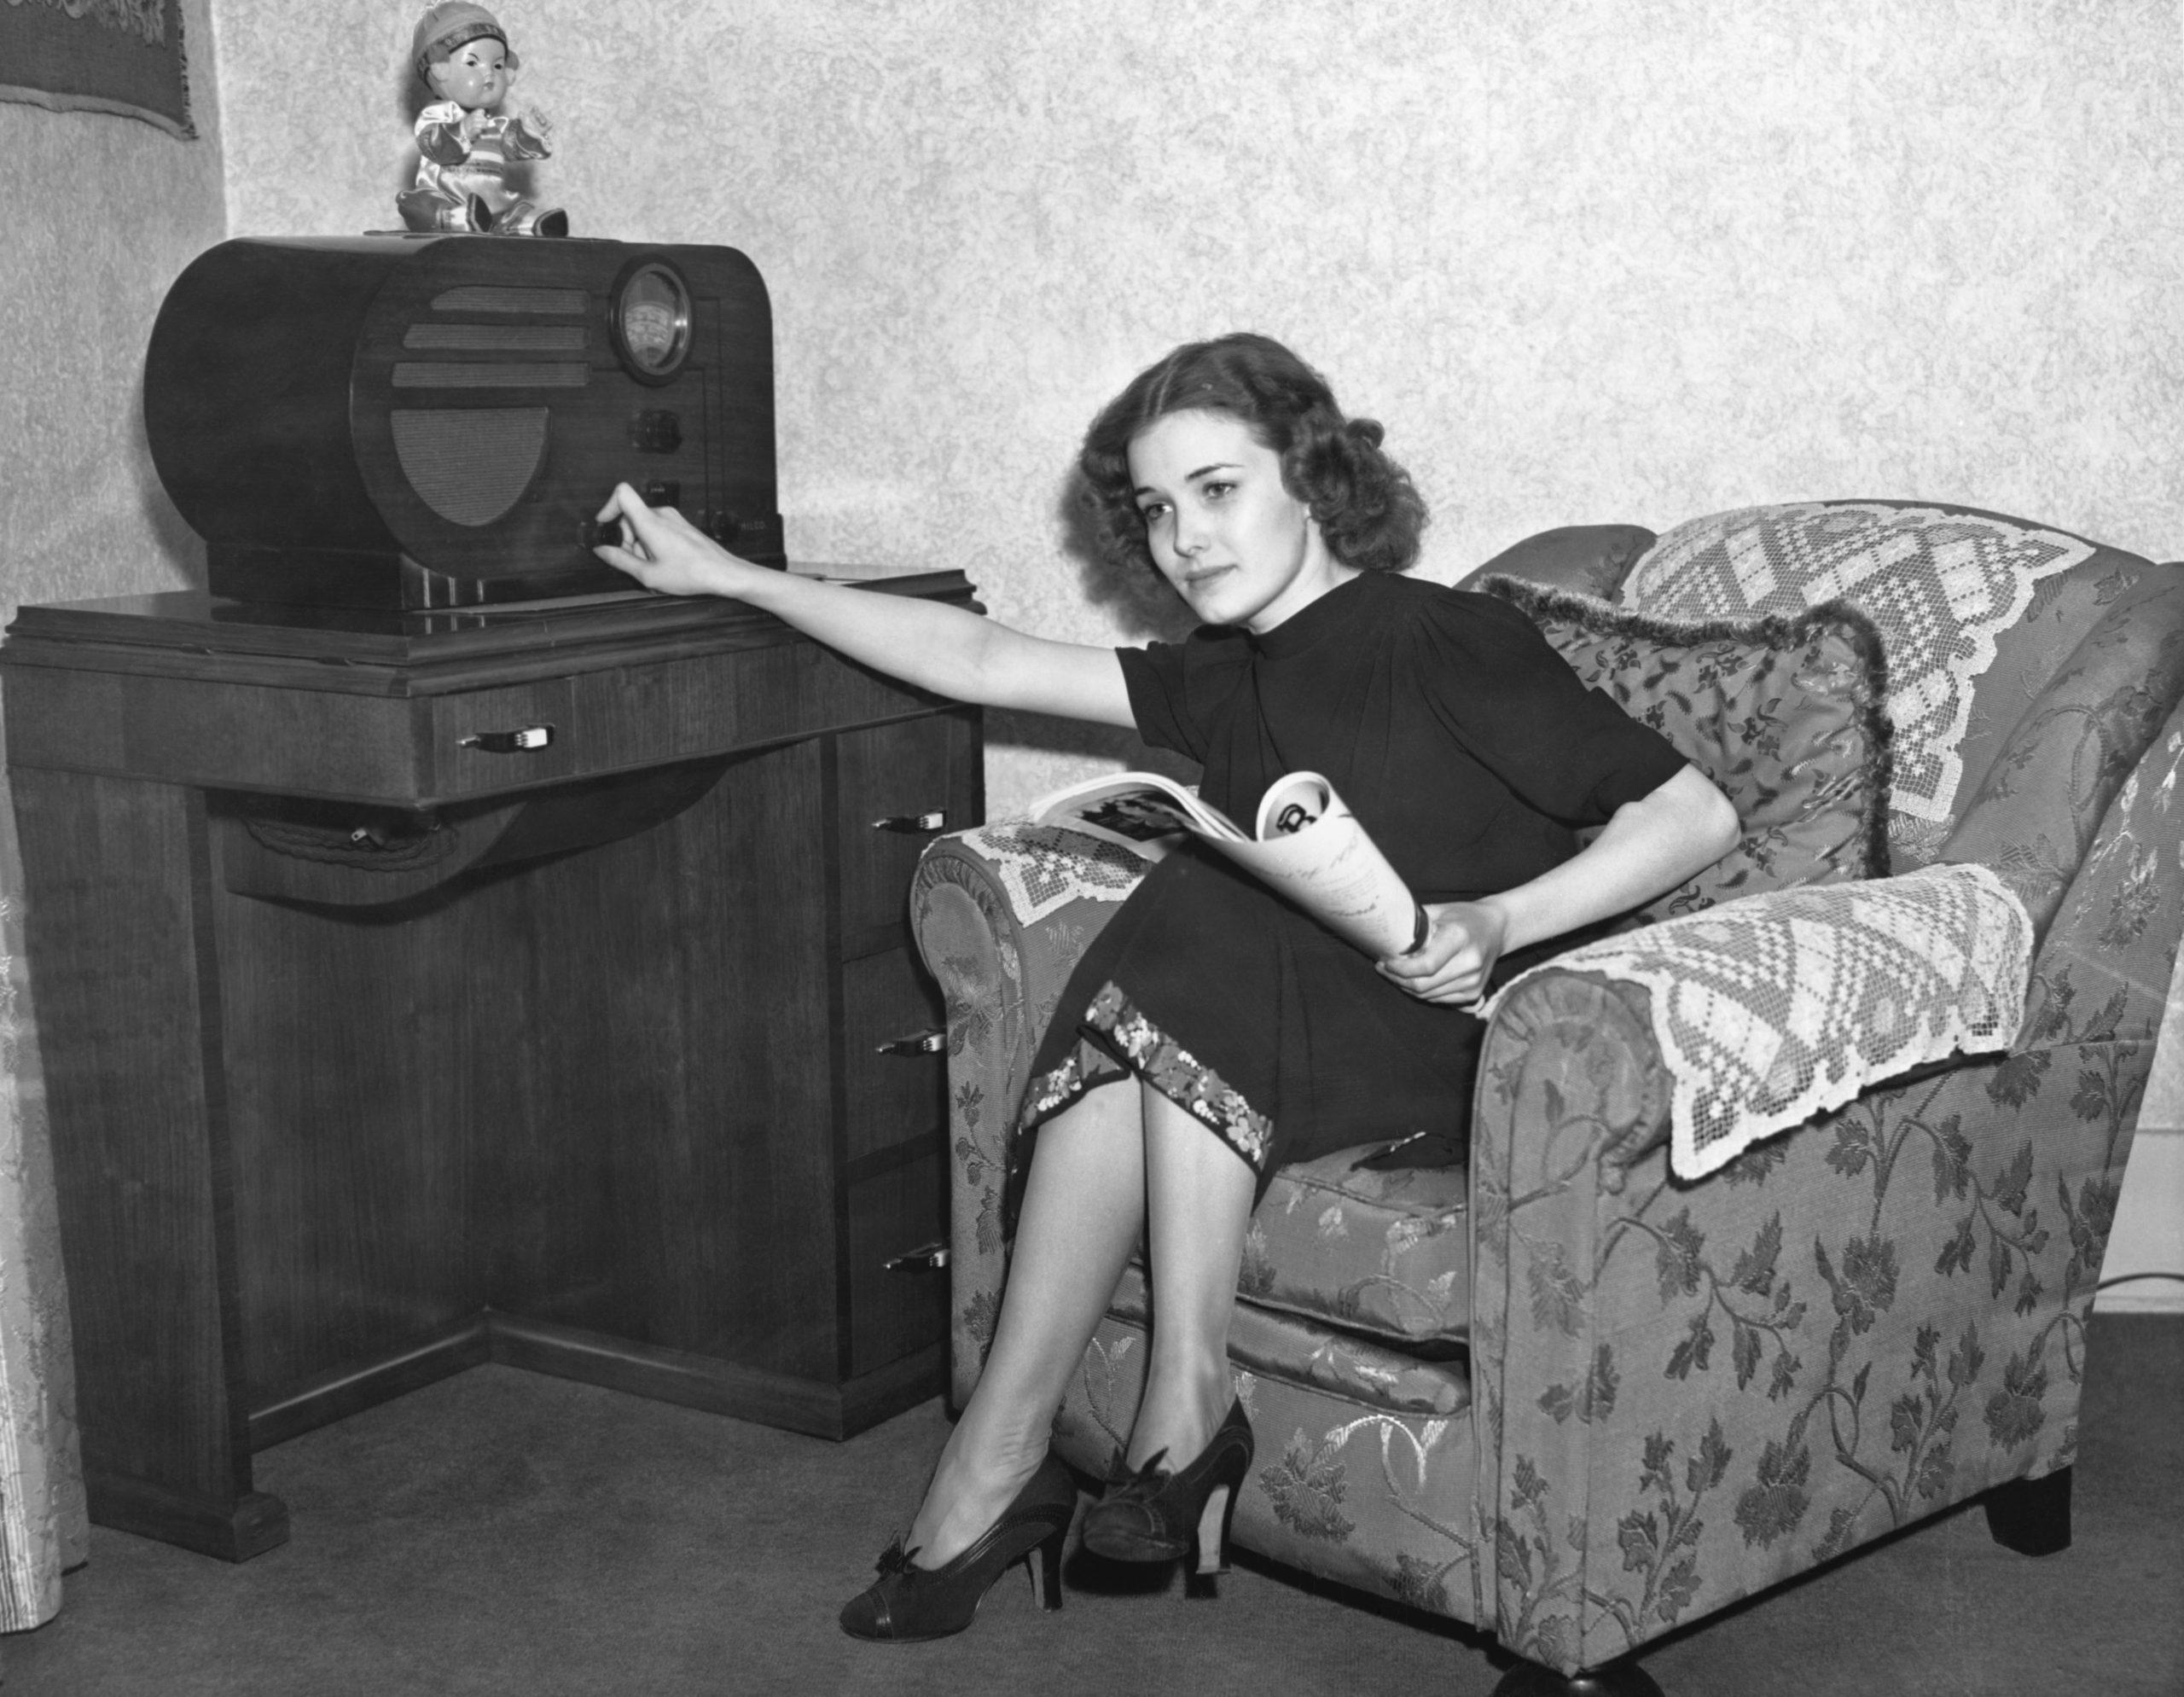 REPEATER RADIO LAUNCHING MONDAY 18TH JANUARY